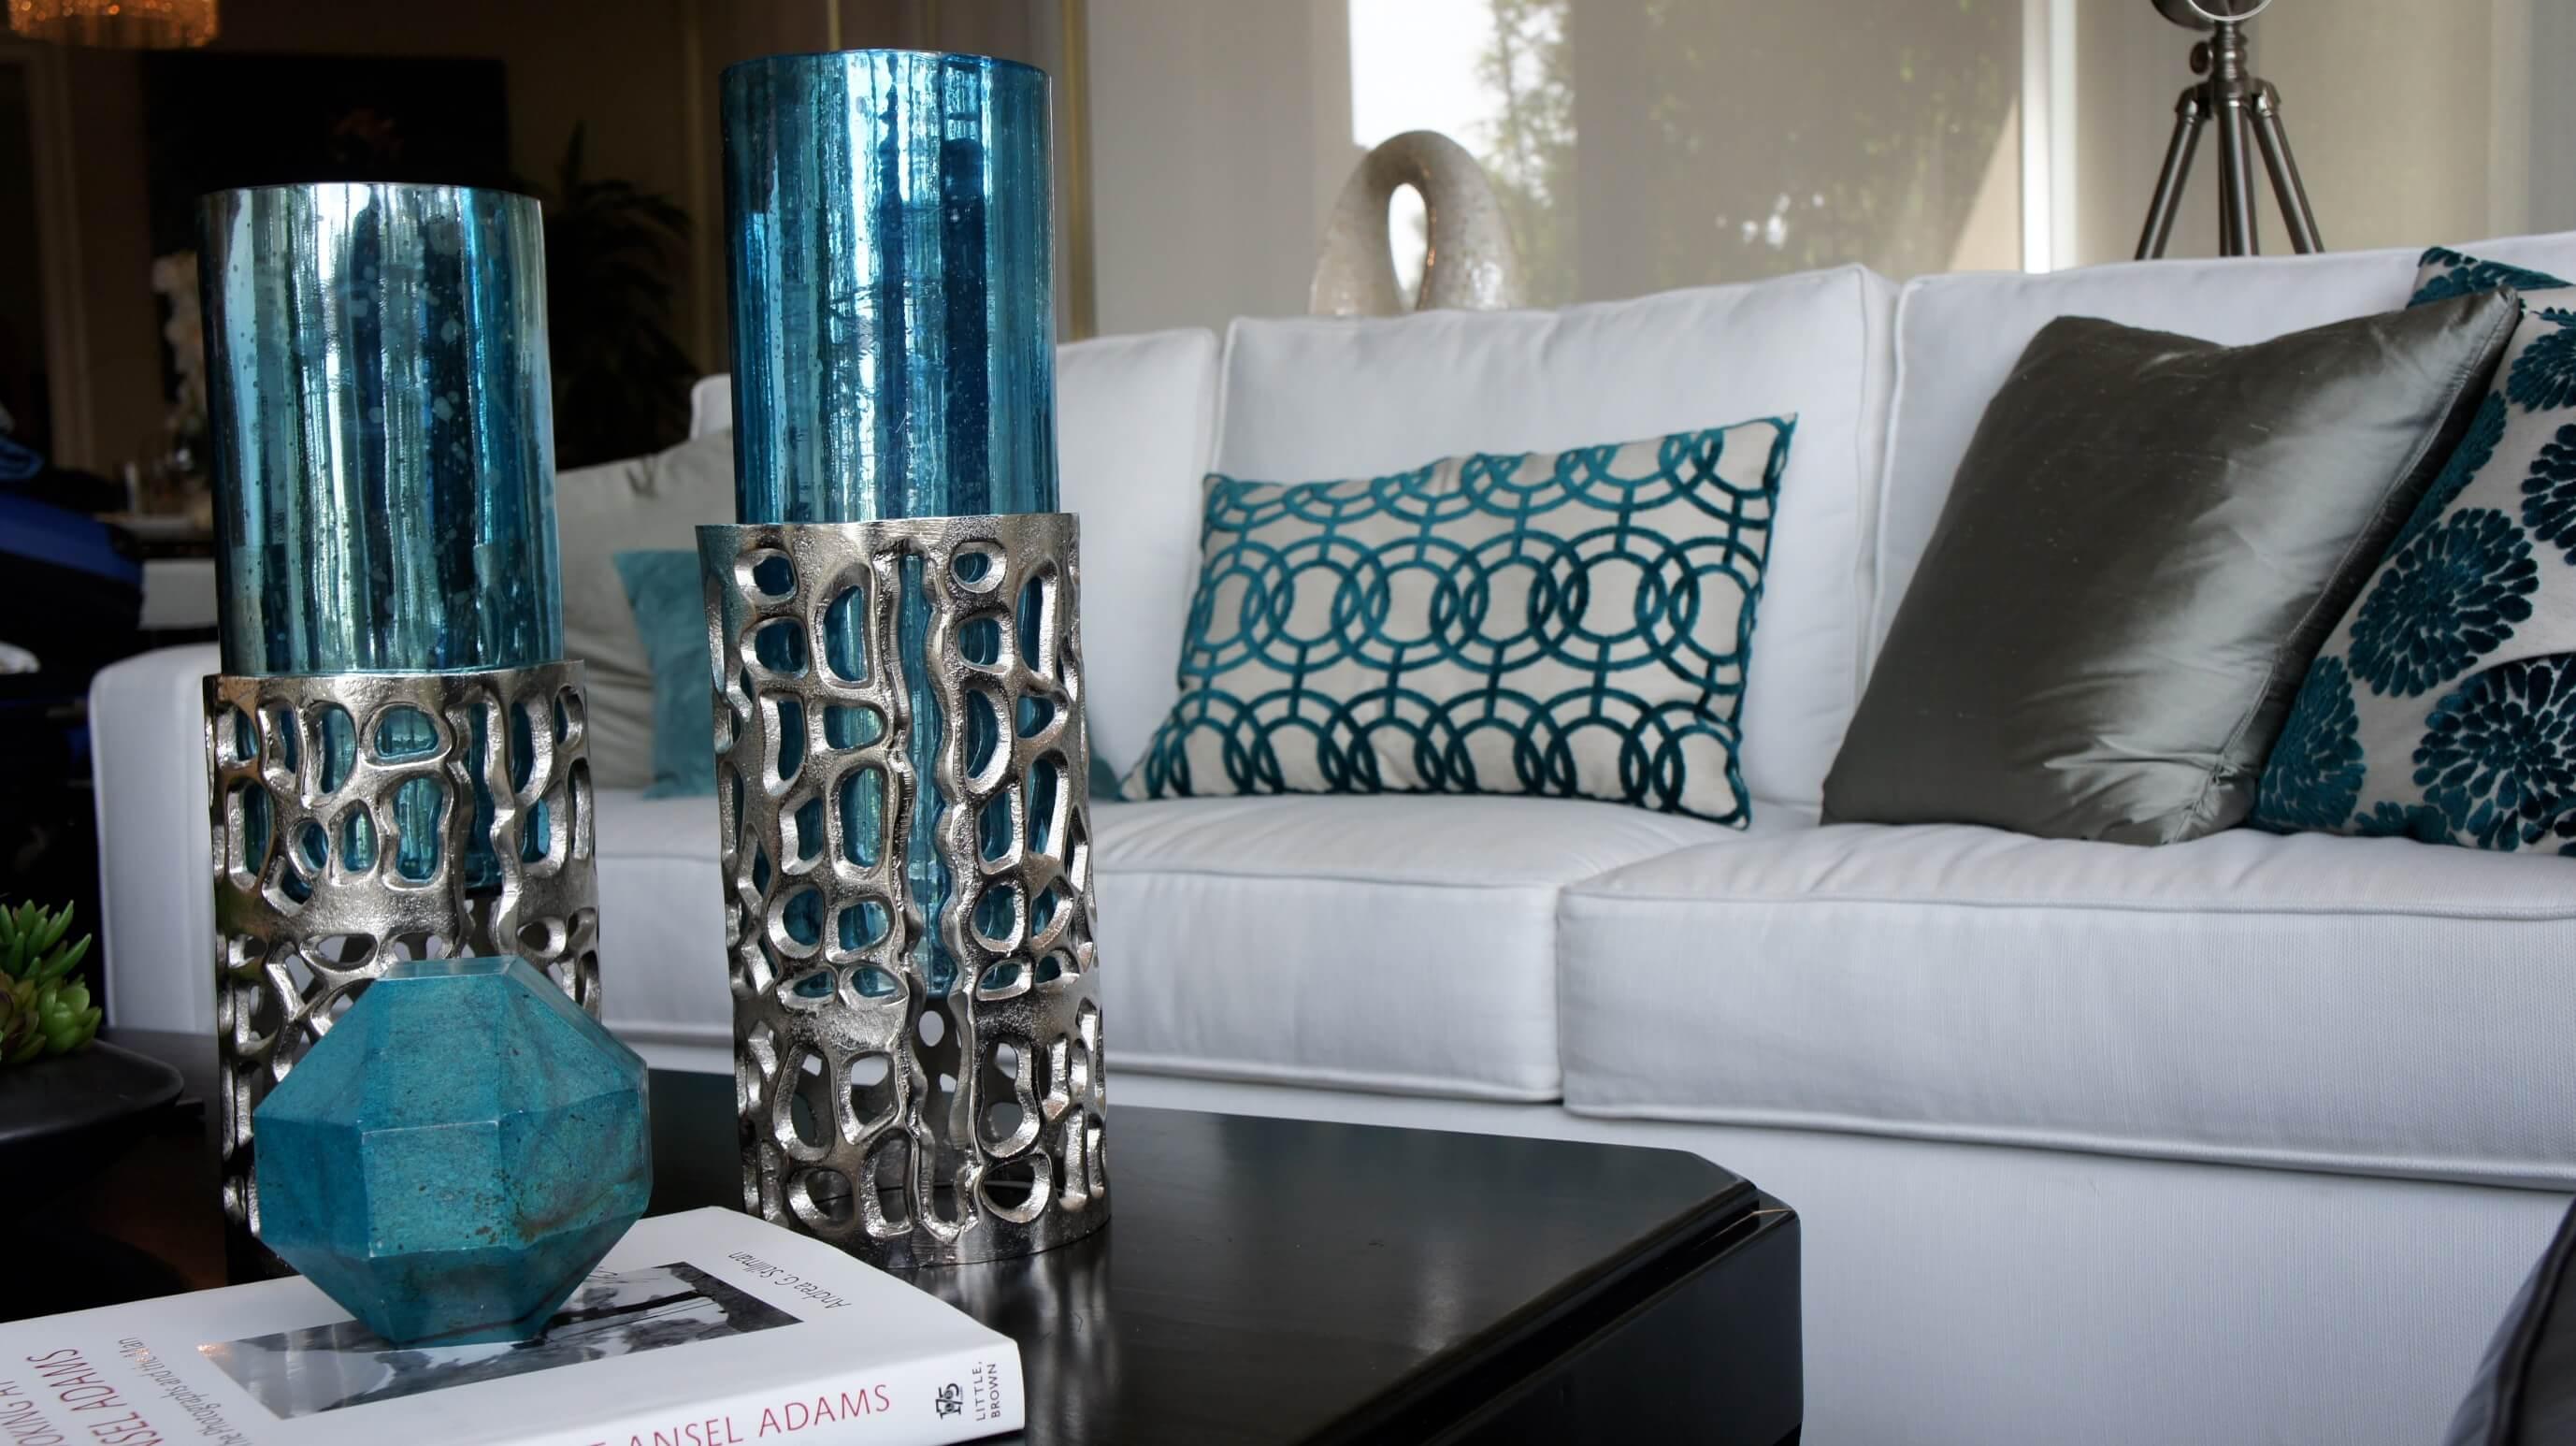 astoria-at-central-park-west-x-nubry-luxury-apartments-irvine-california-8